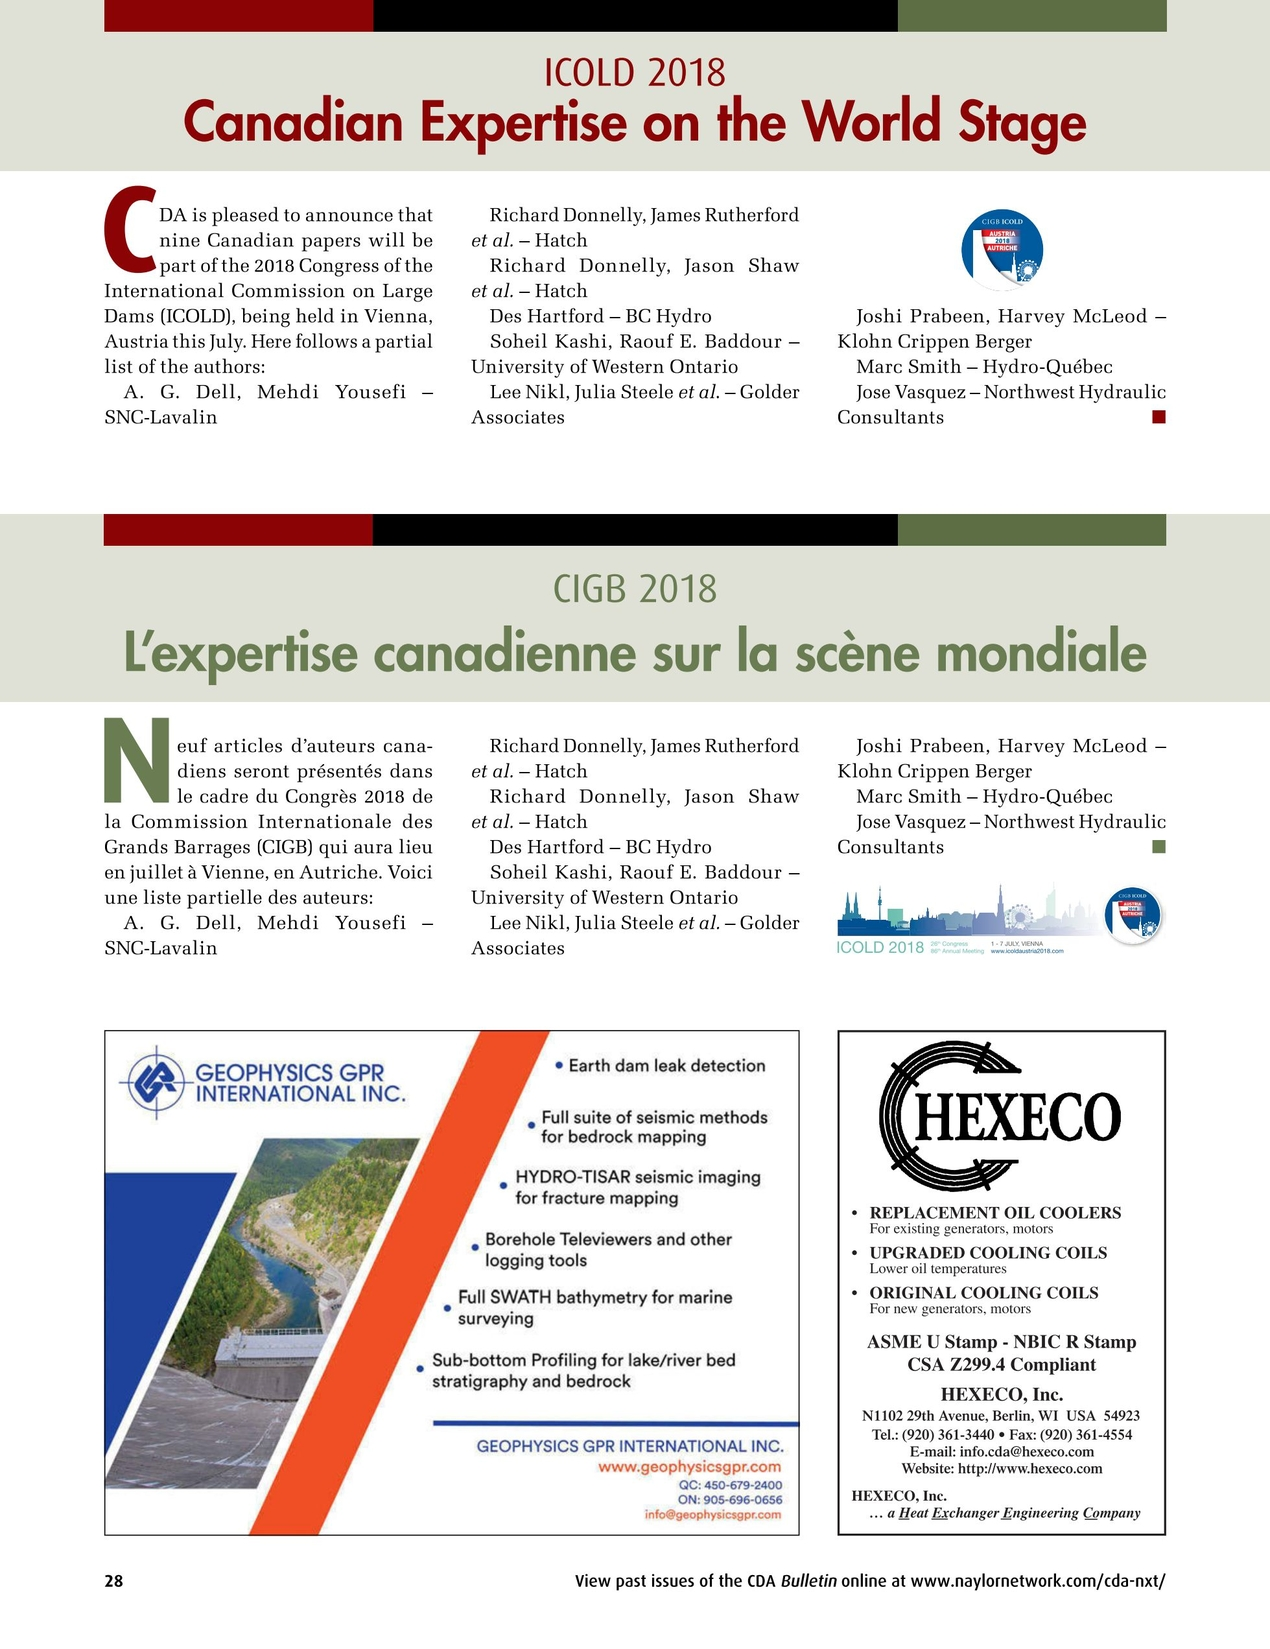 Canadian Dam Association Bulletin - Summer 2018